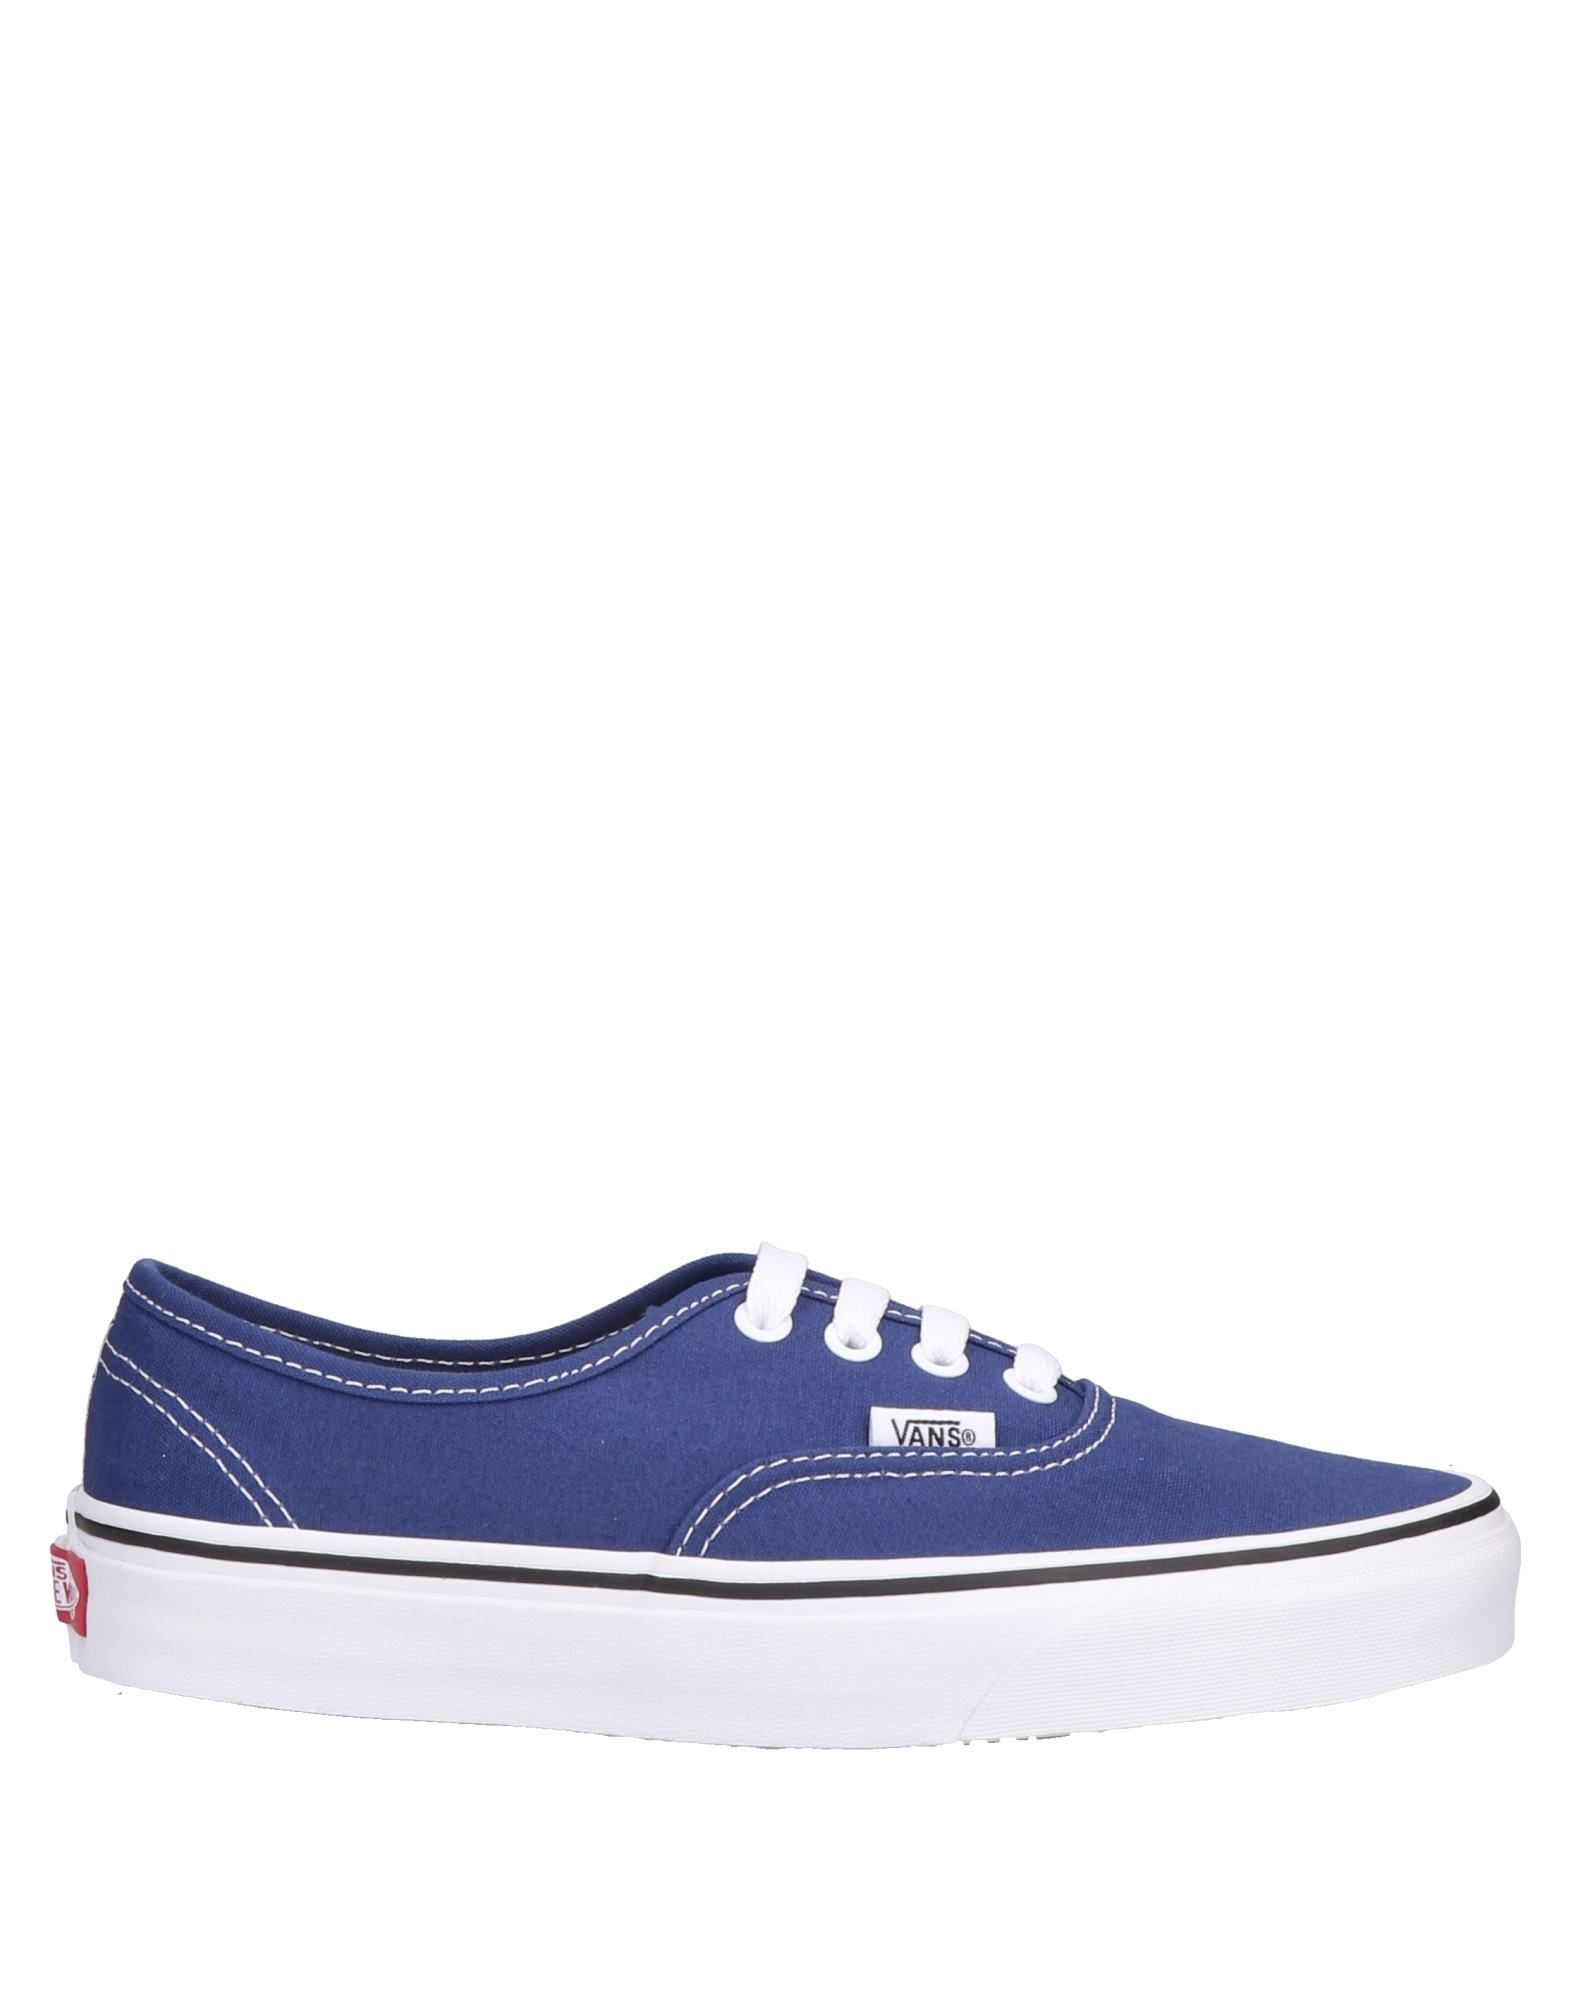 Zapatillas Vans Mujer - Zapatillas Vans  Azul Azul  marino fb114e